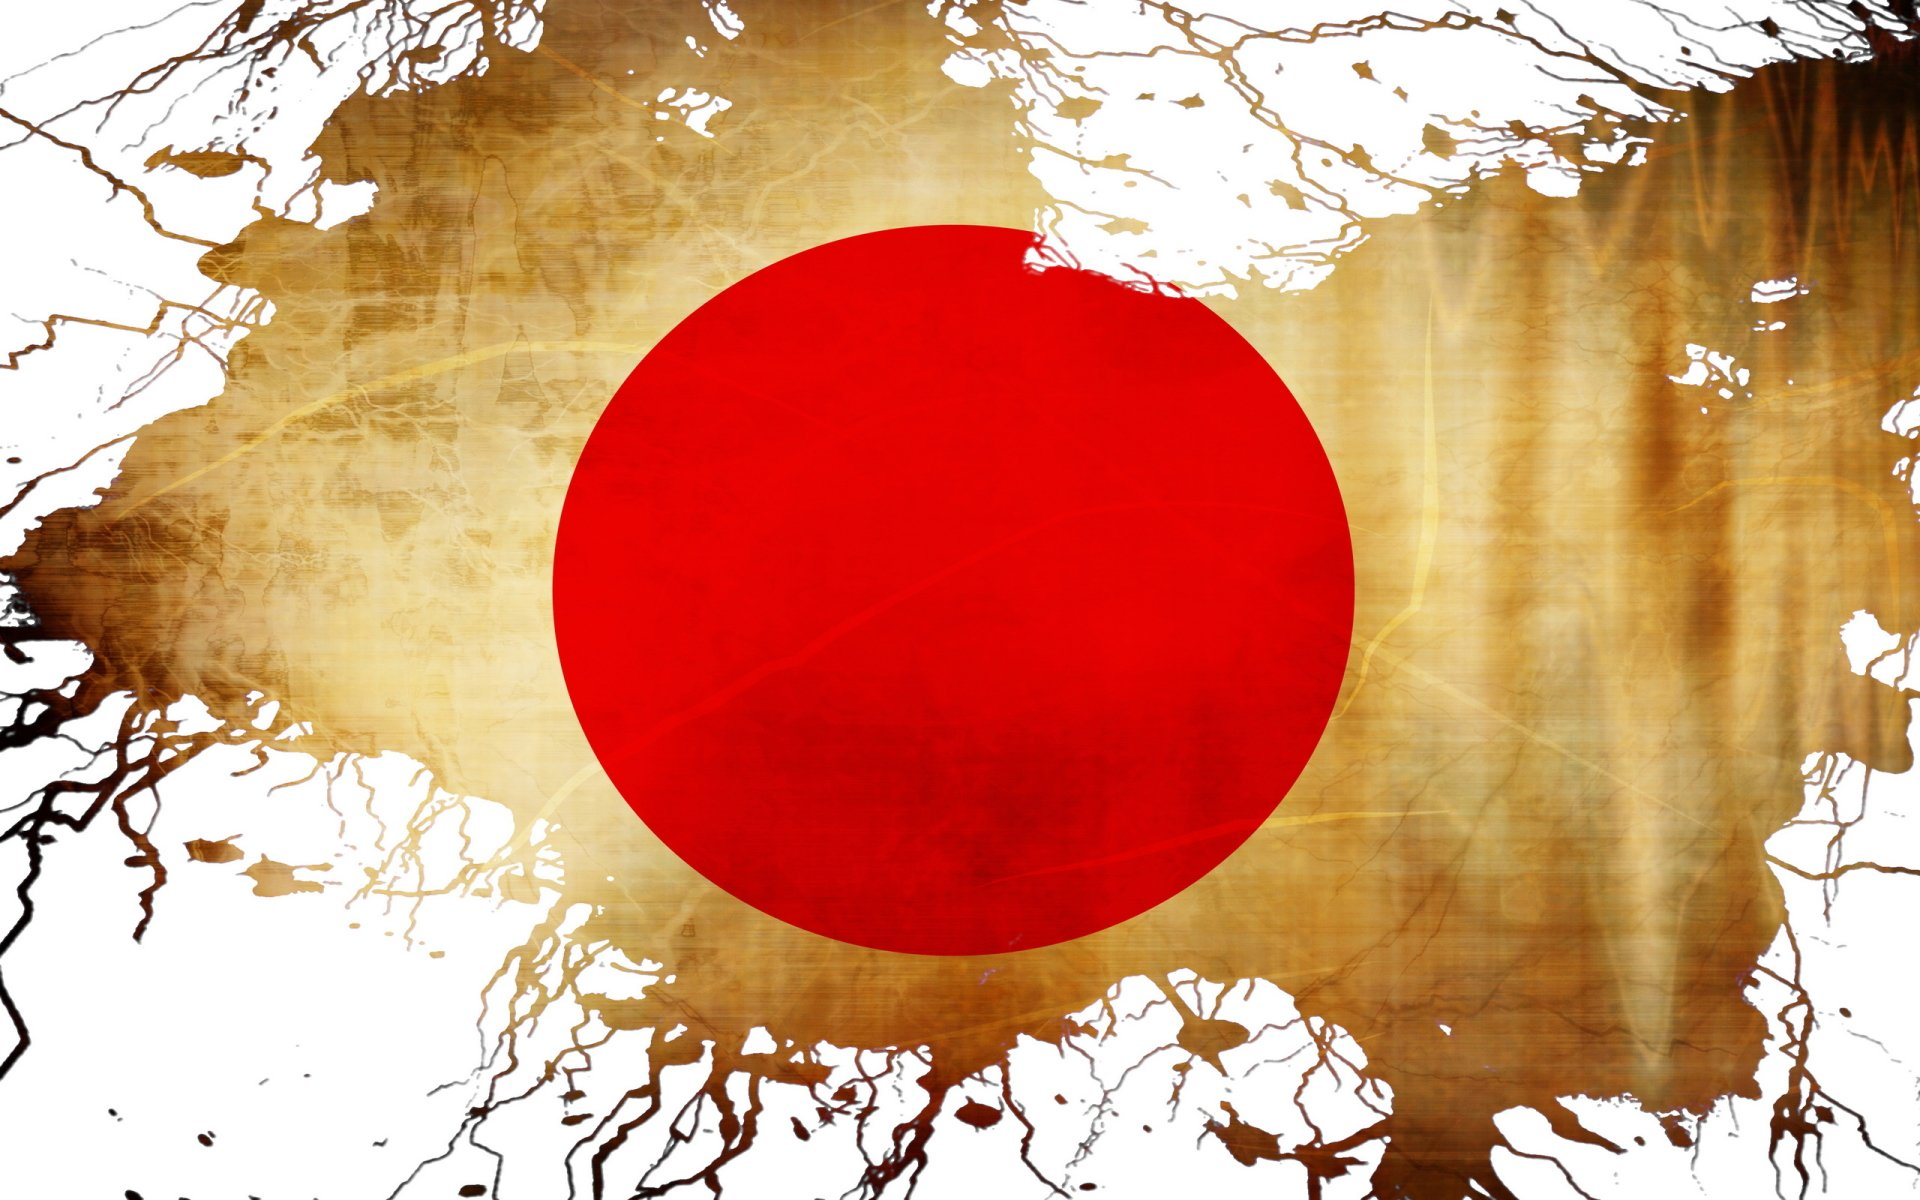 Samurai Wallpaper Iphone 6 Flag Of Japan Full Hd Wallpaper And Background Image